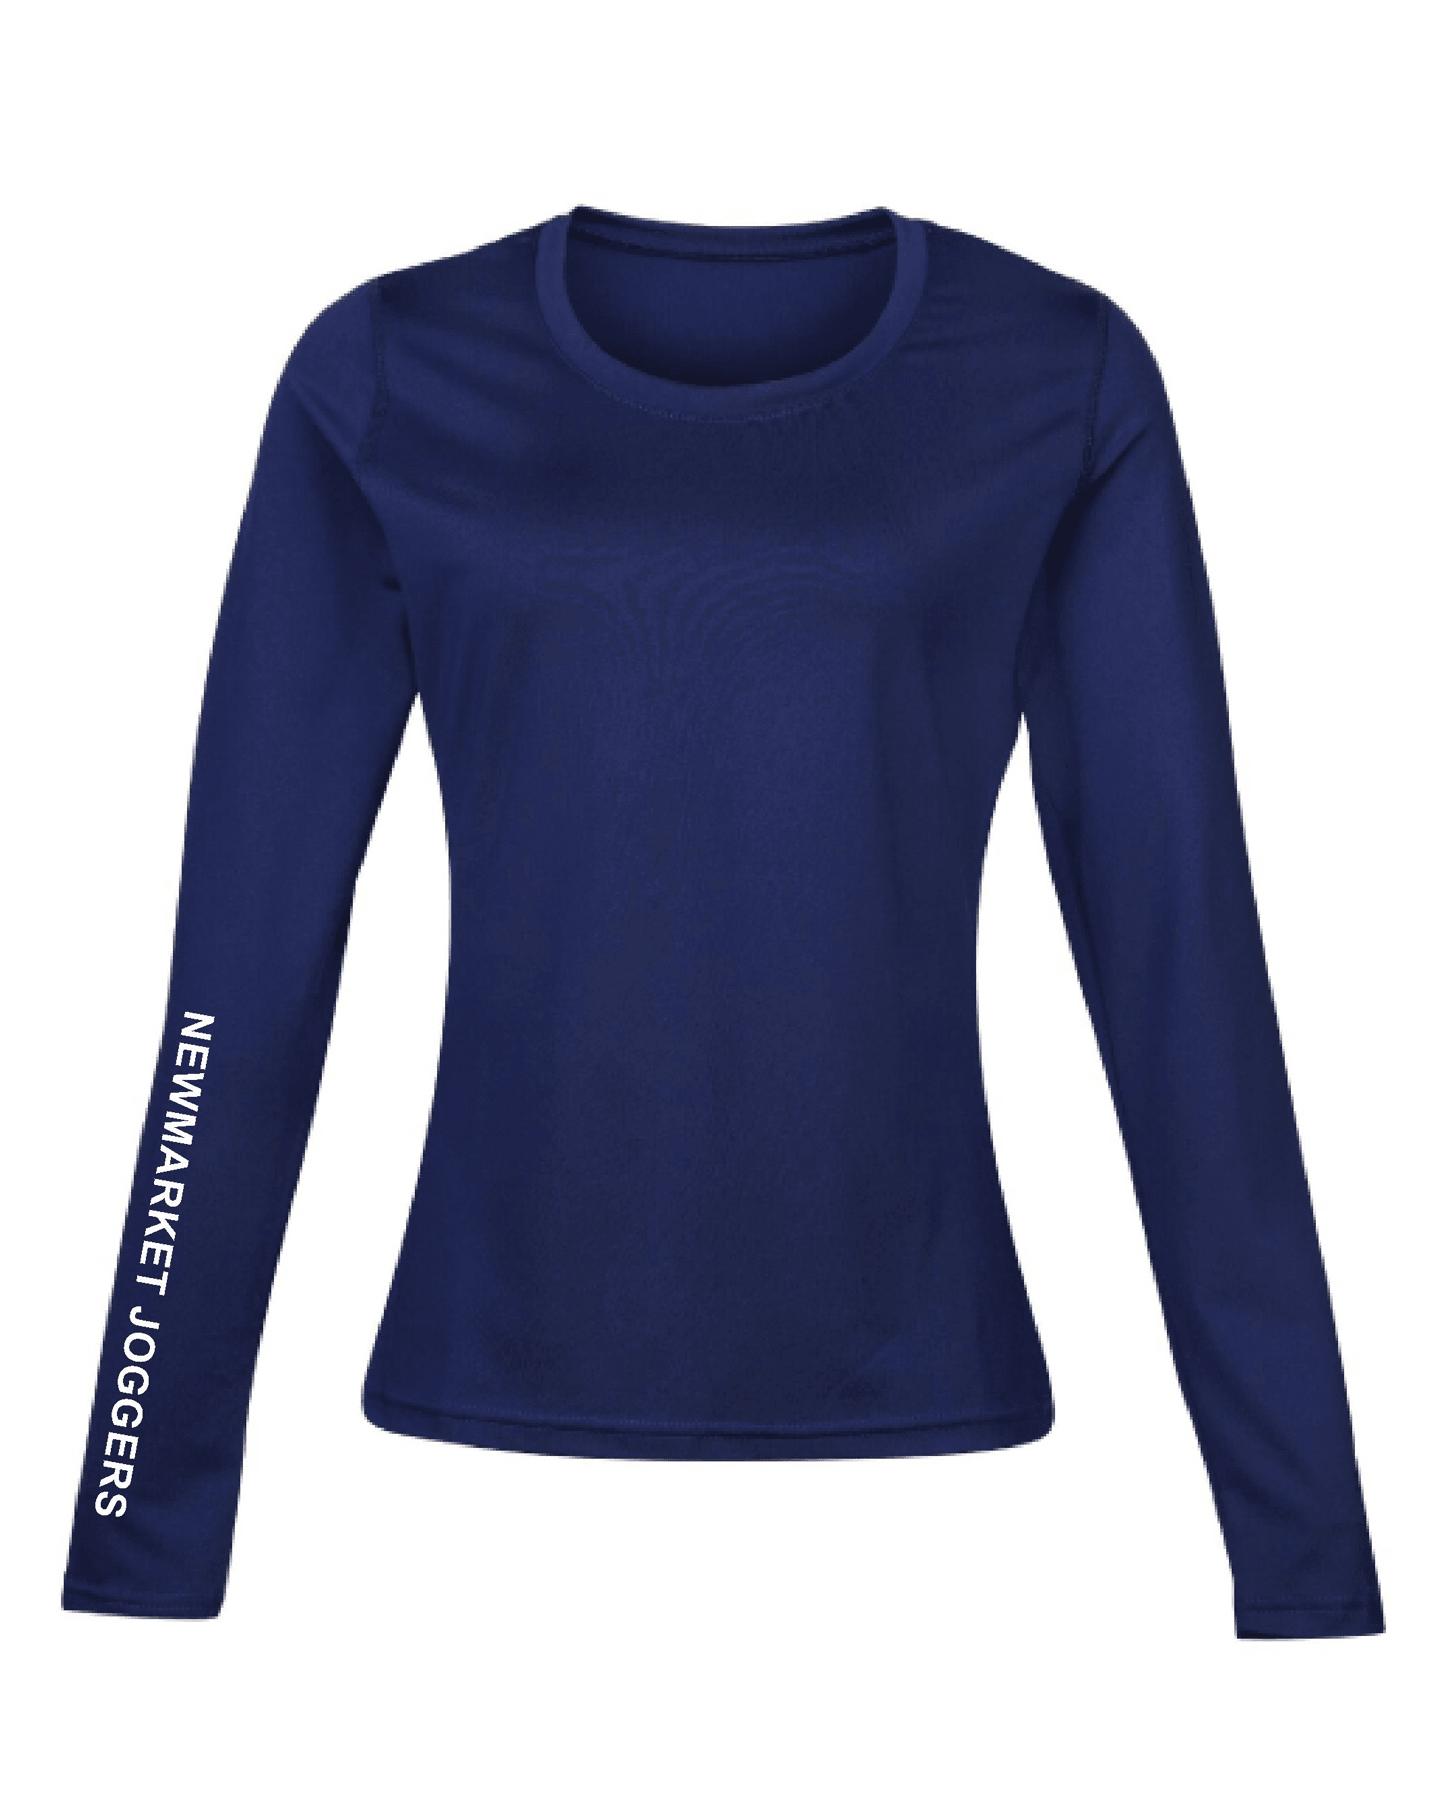 Newmarket Joggers – Baselayer (Ladies)